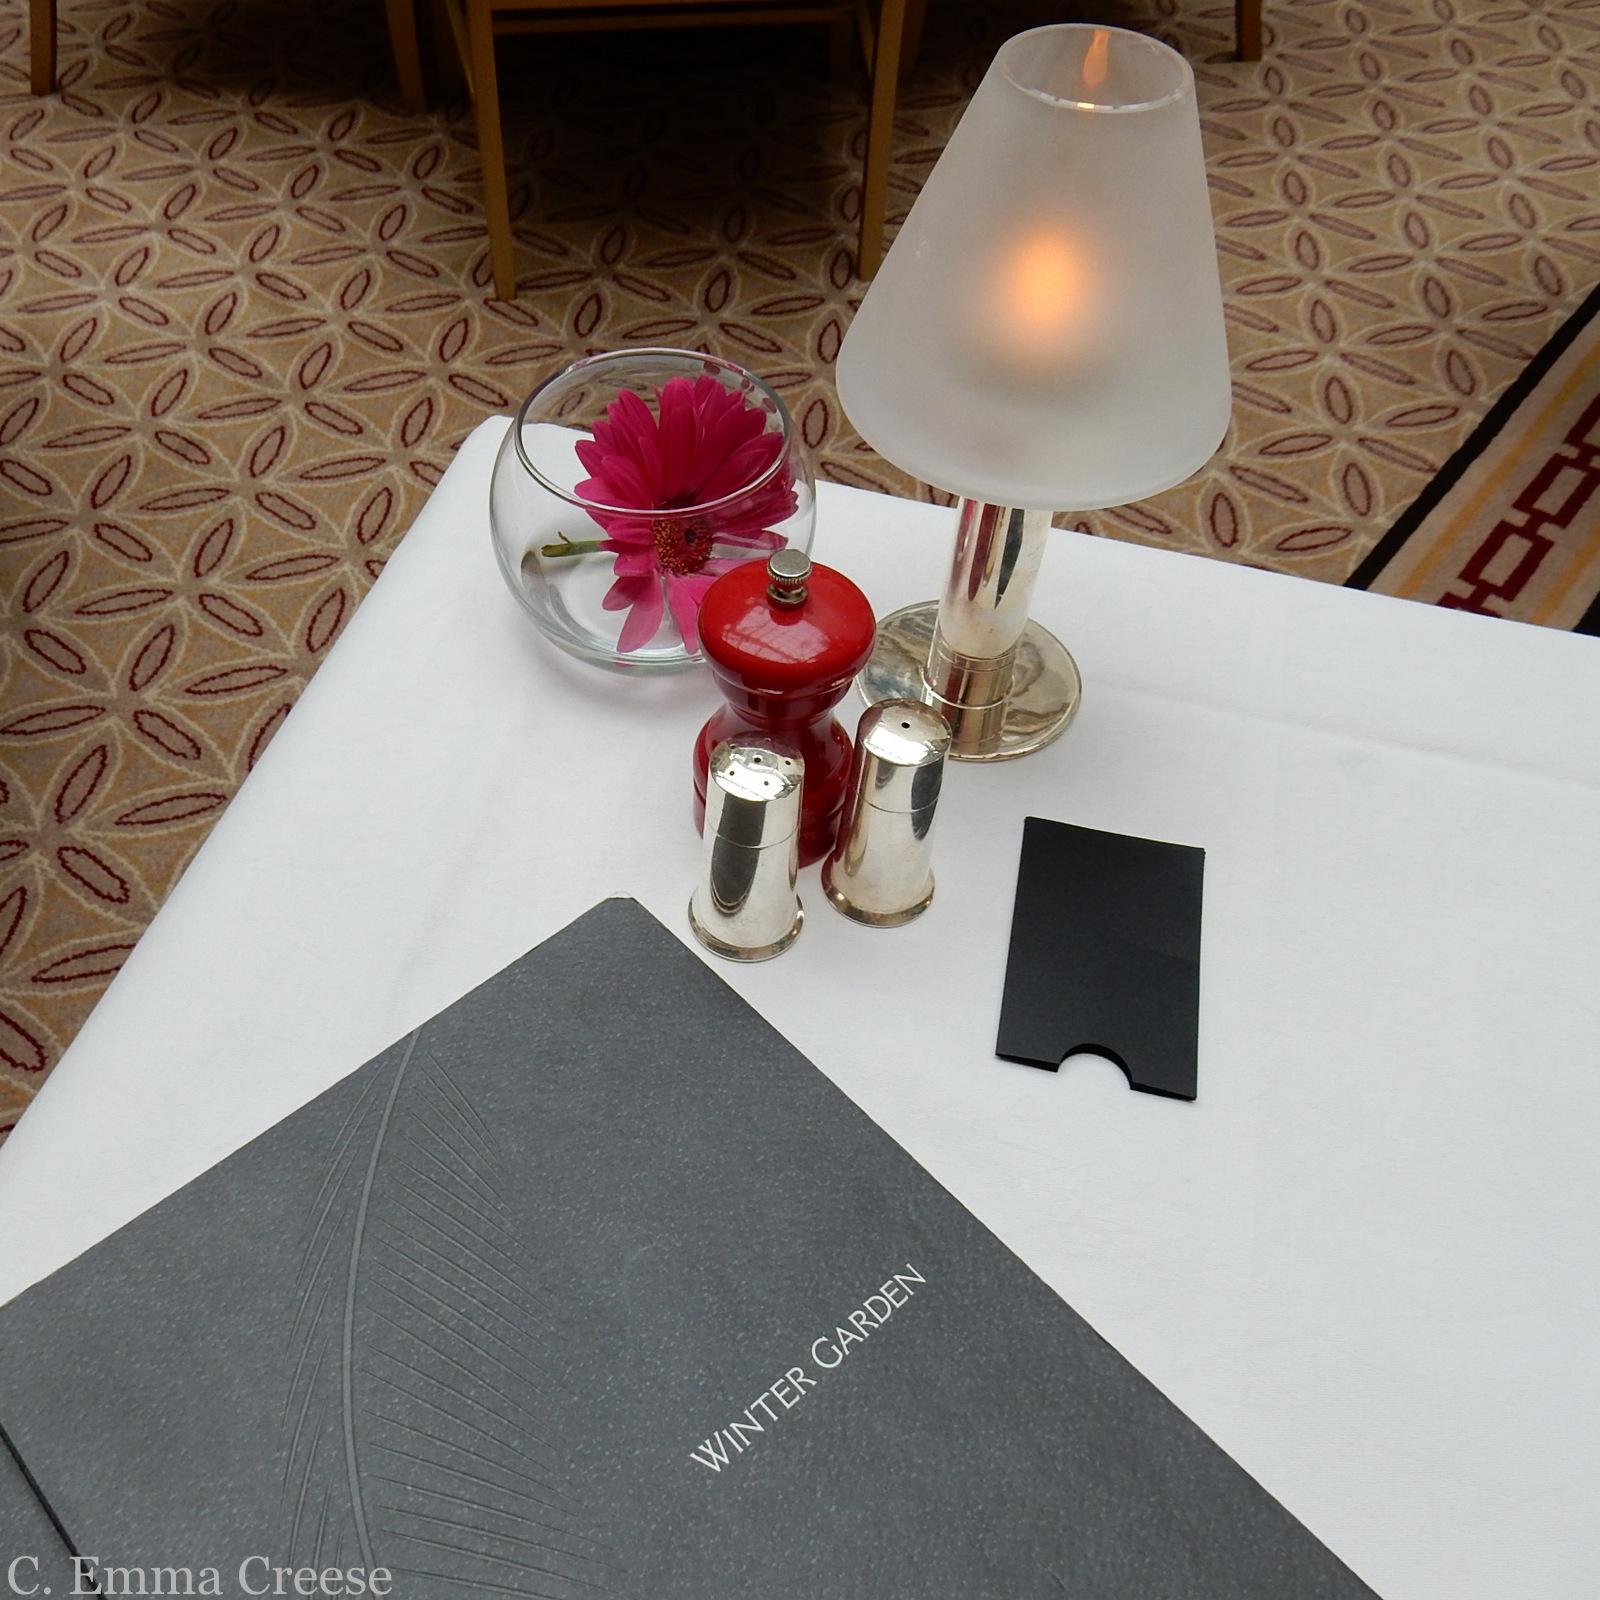 The Winter Garden Landmark Hotel Restaurant Review Adventures of a London Kiwi